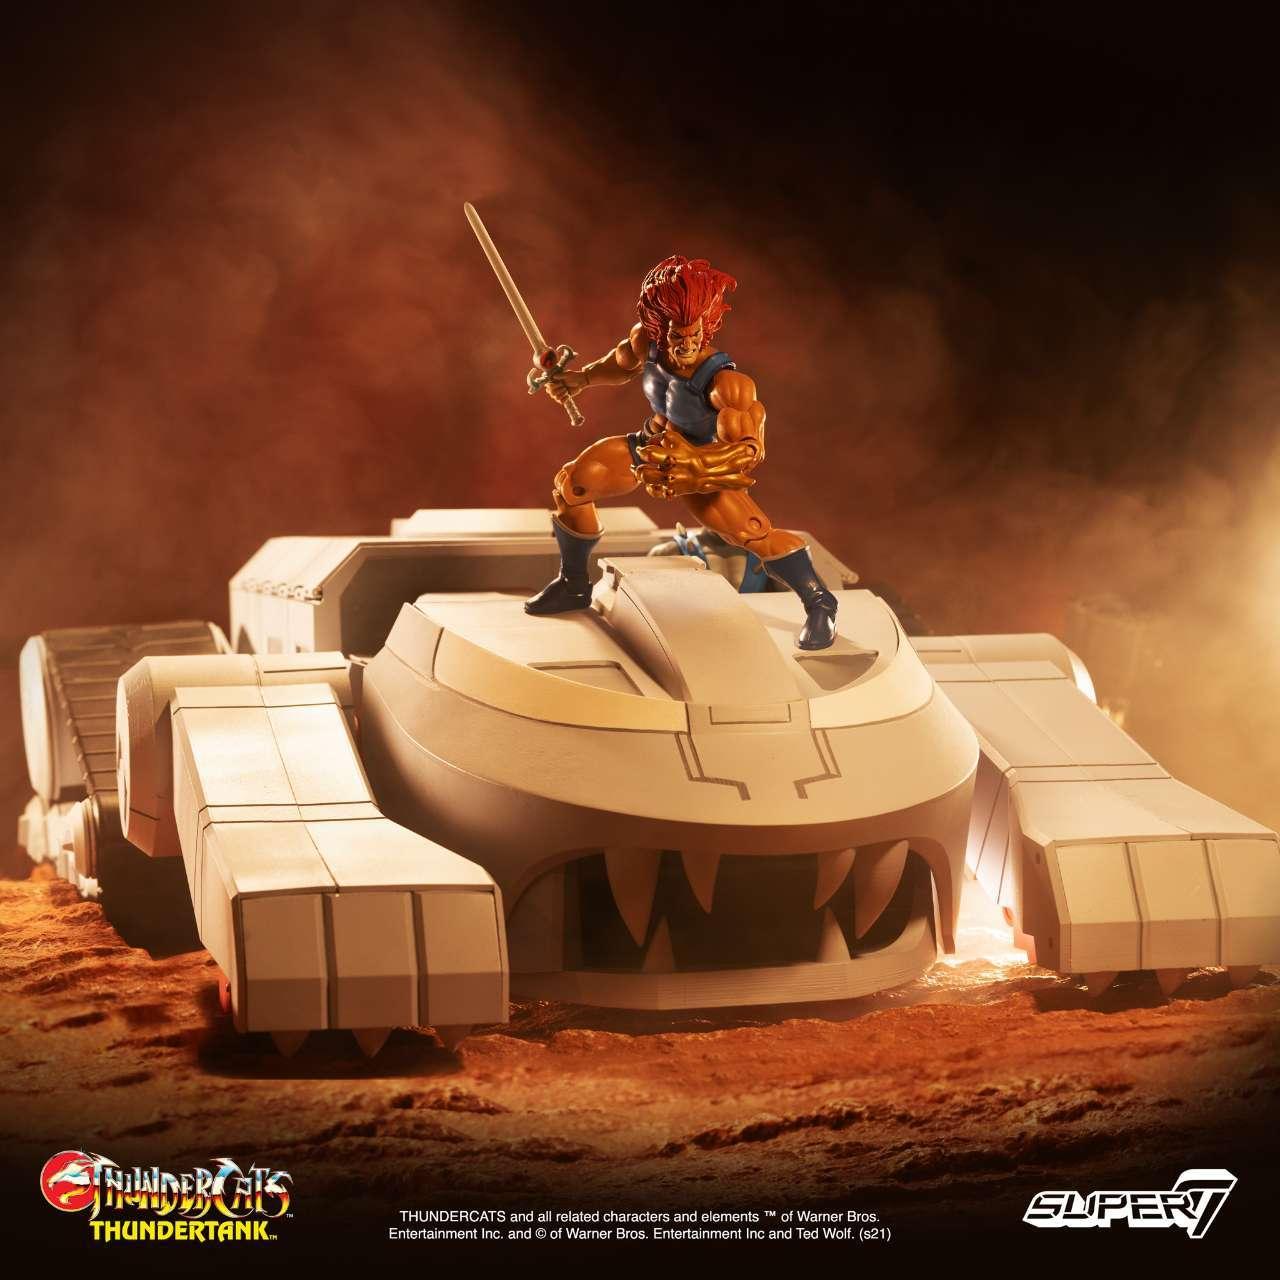 thundercats-ultimates-thundertank